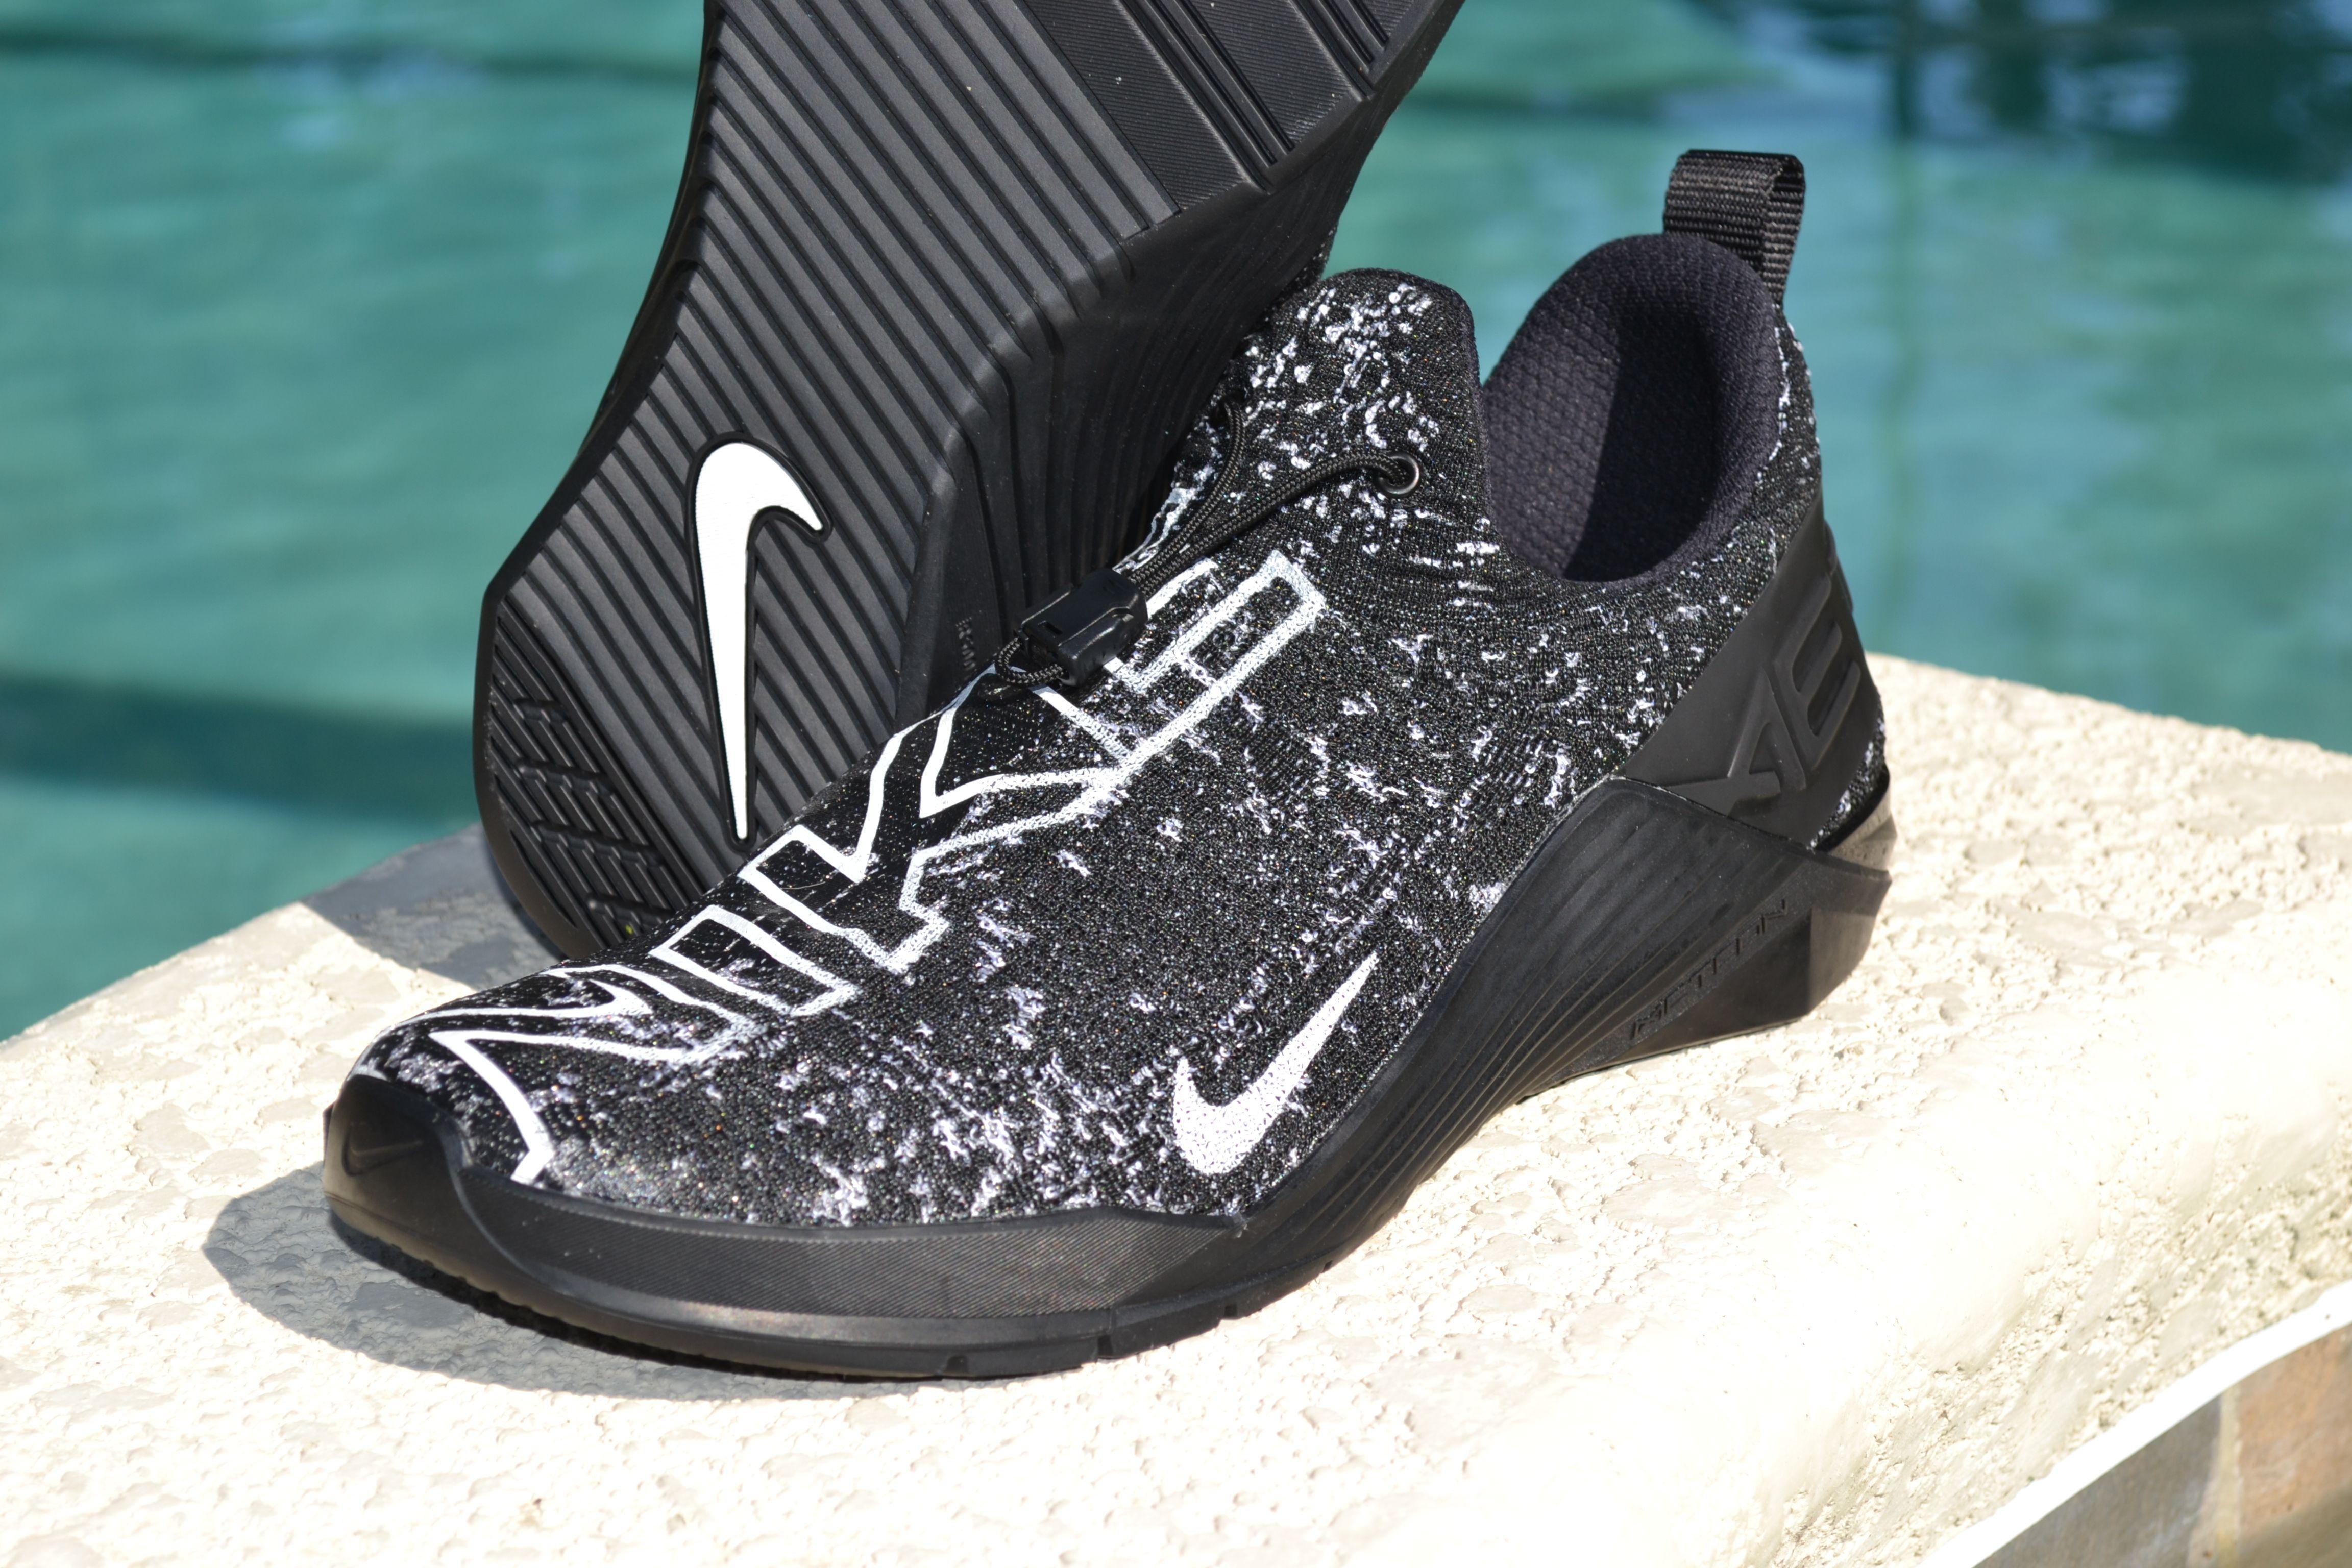 Nike React Metcon training shoe for